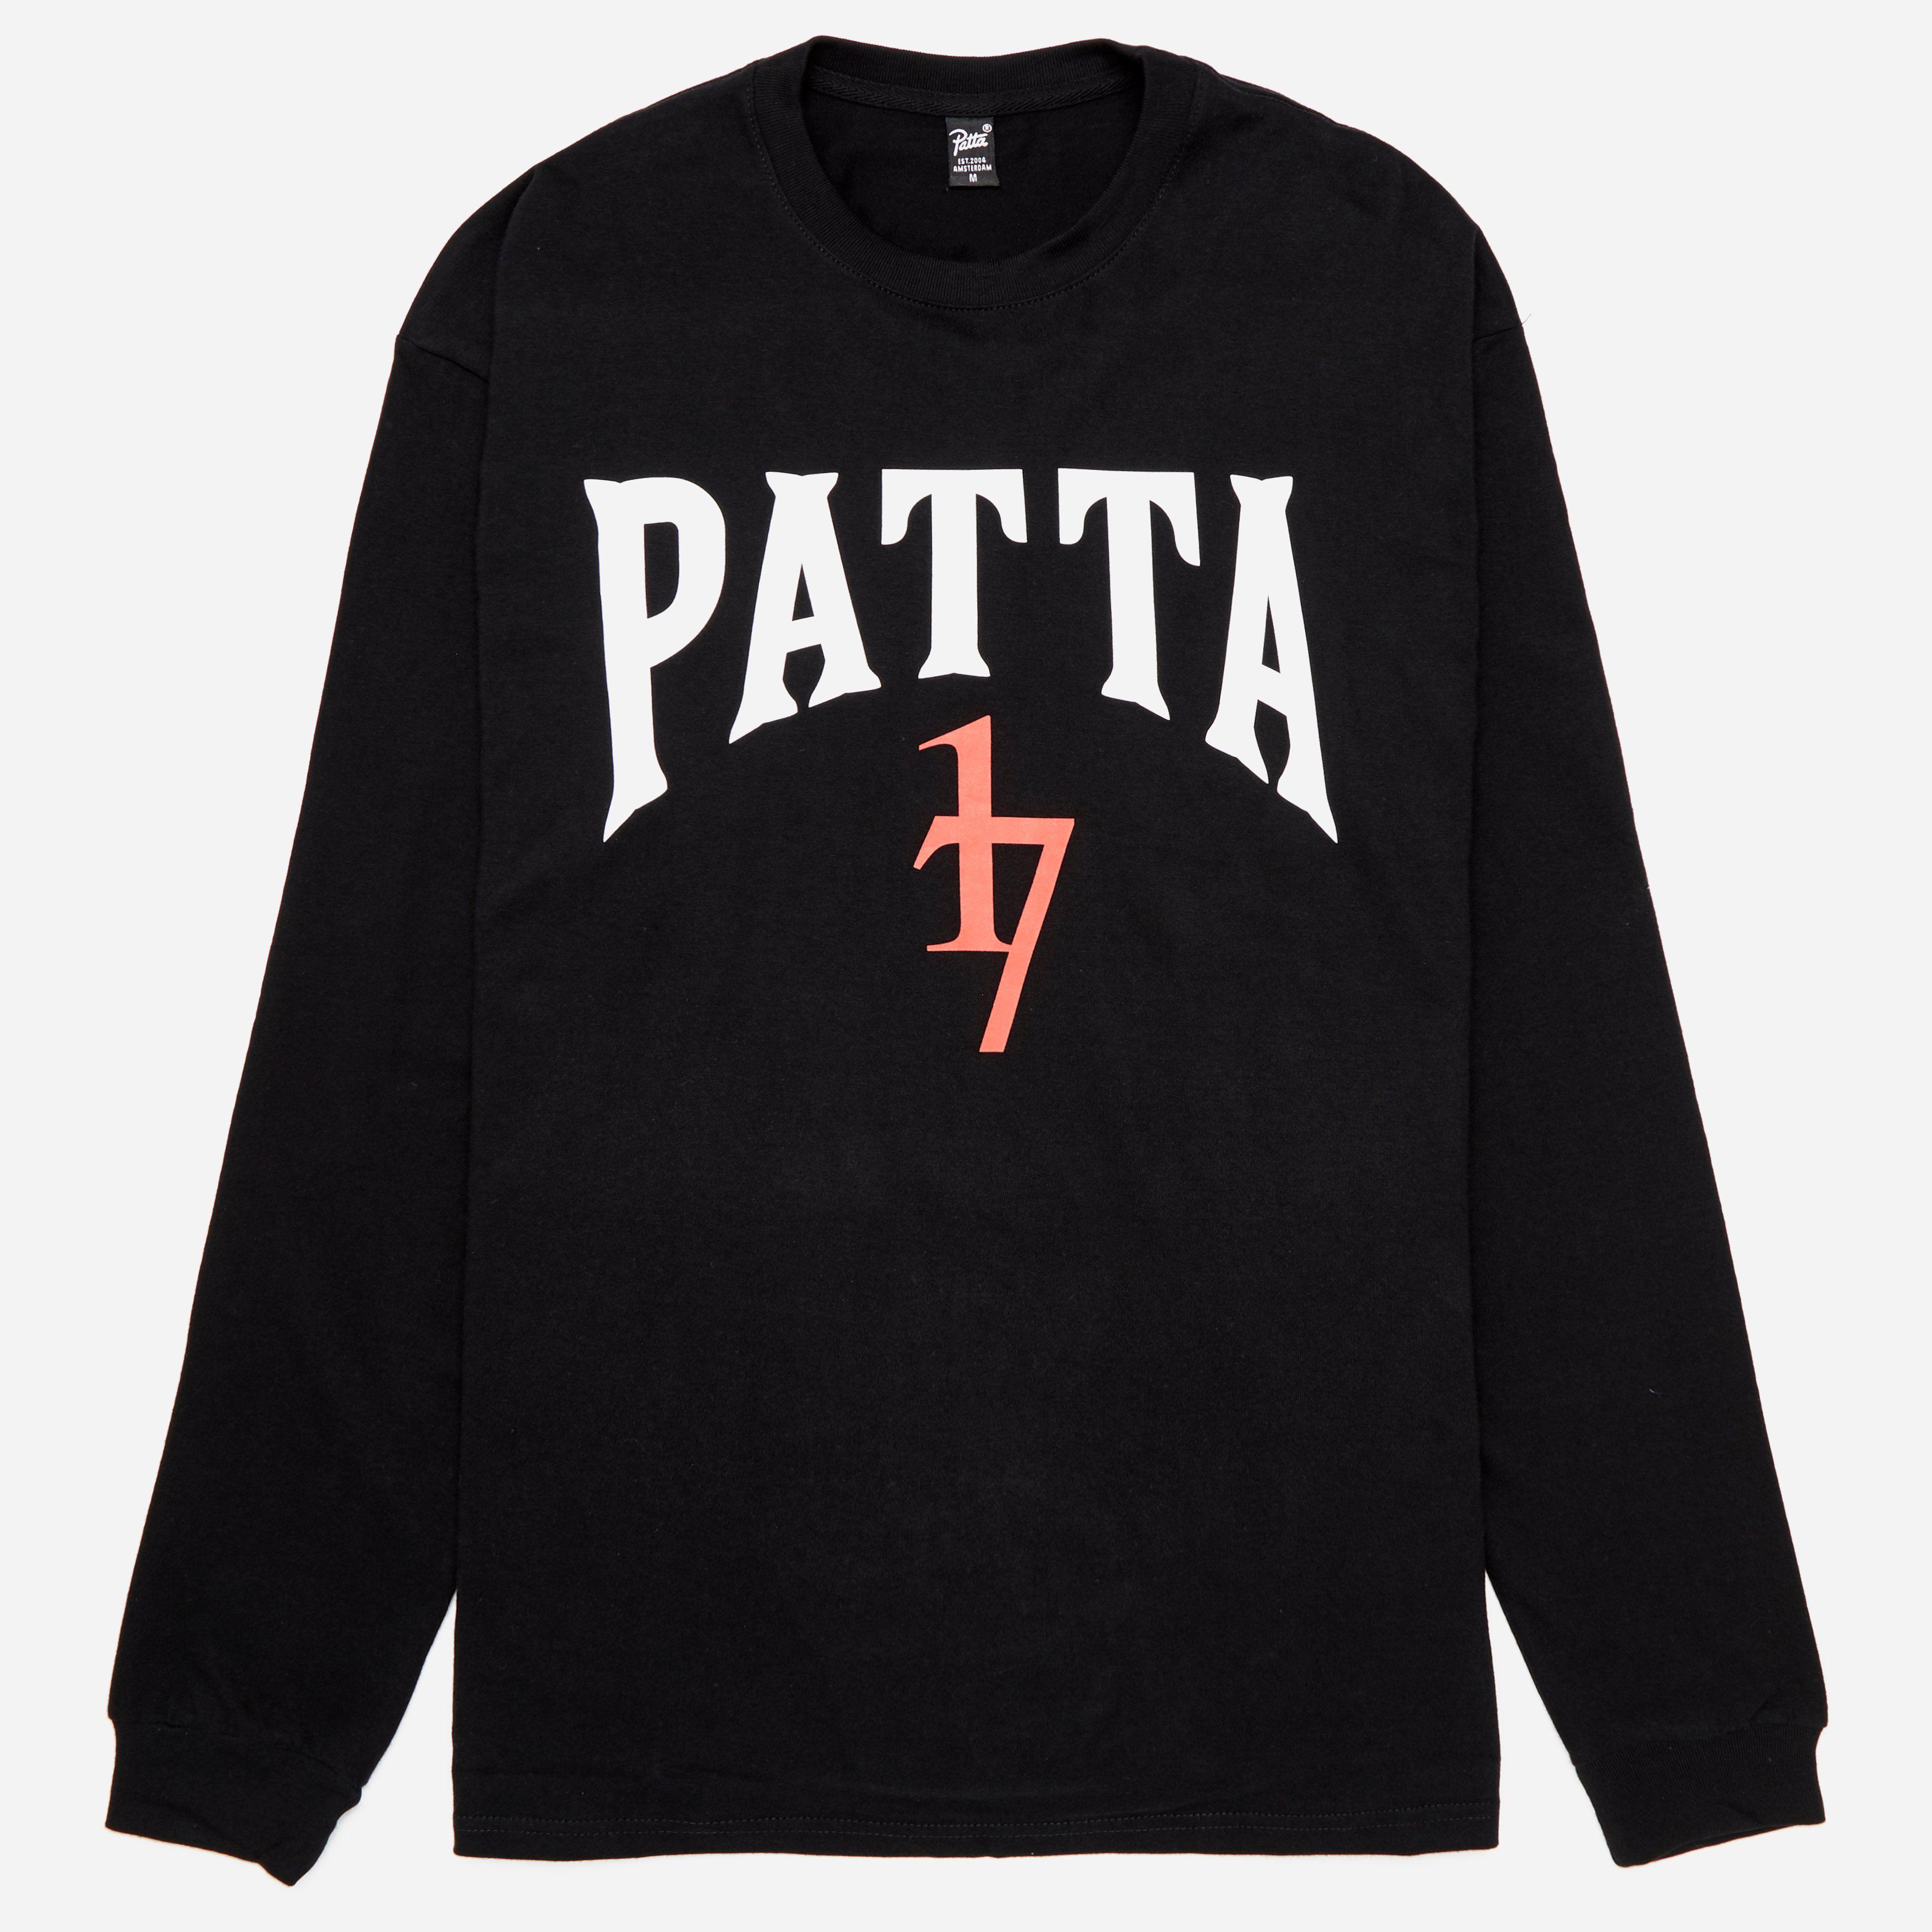 Patta Long Sleeve Life T-shirt